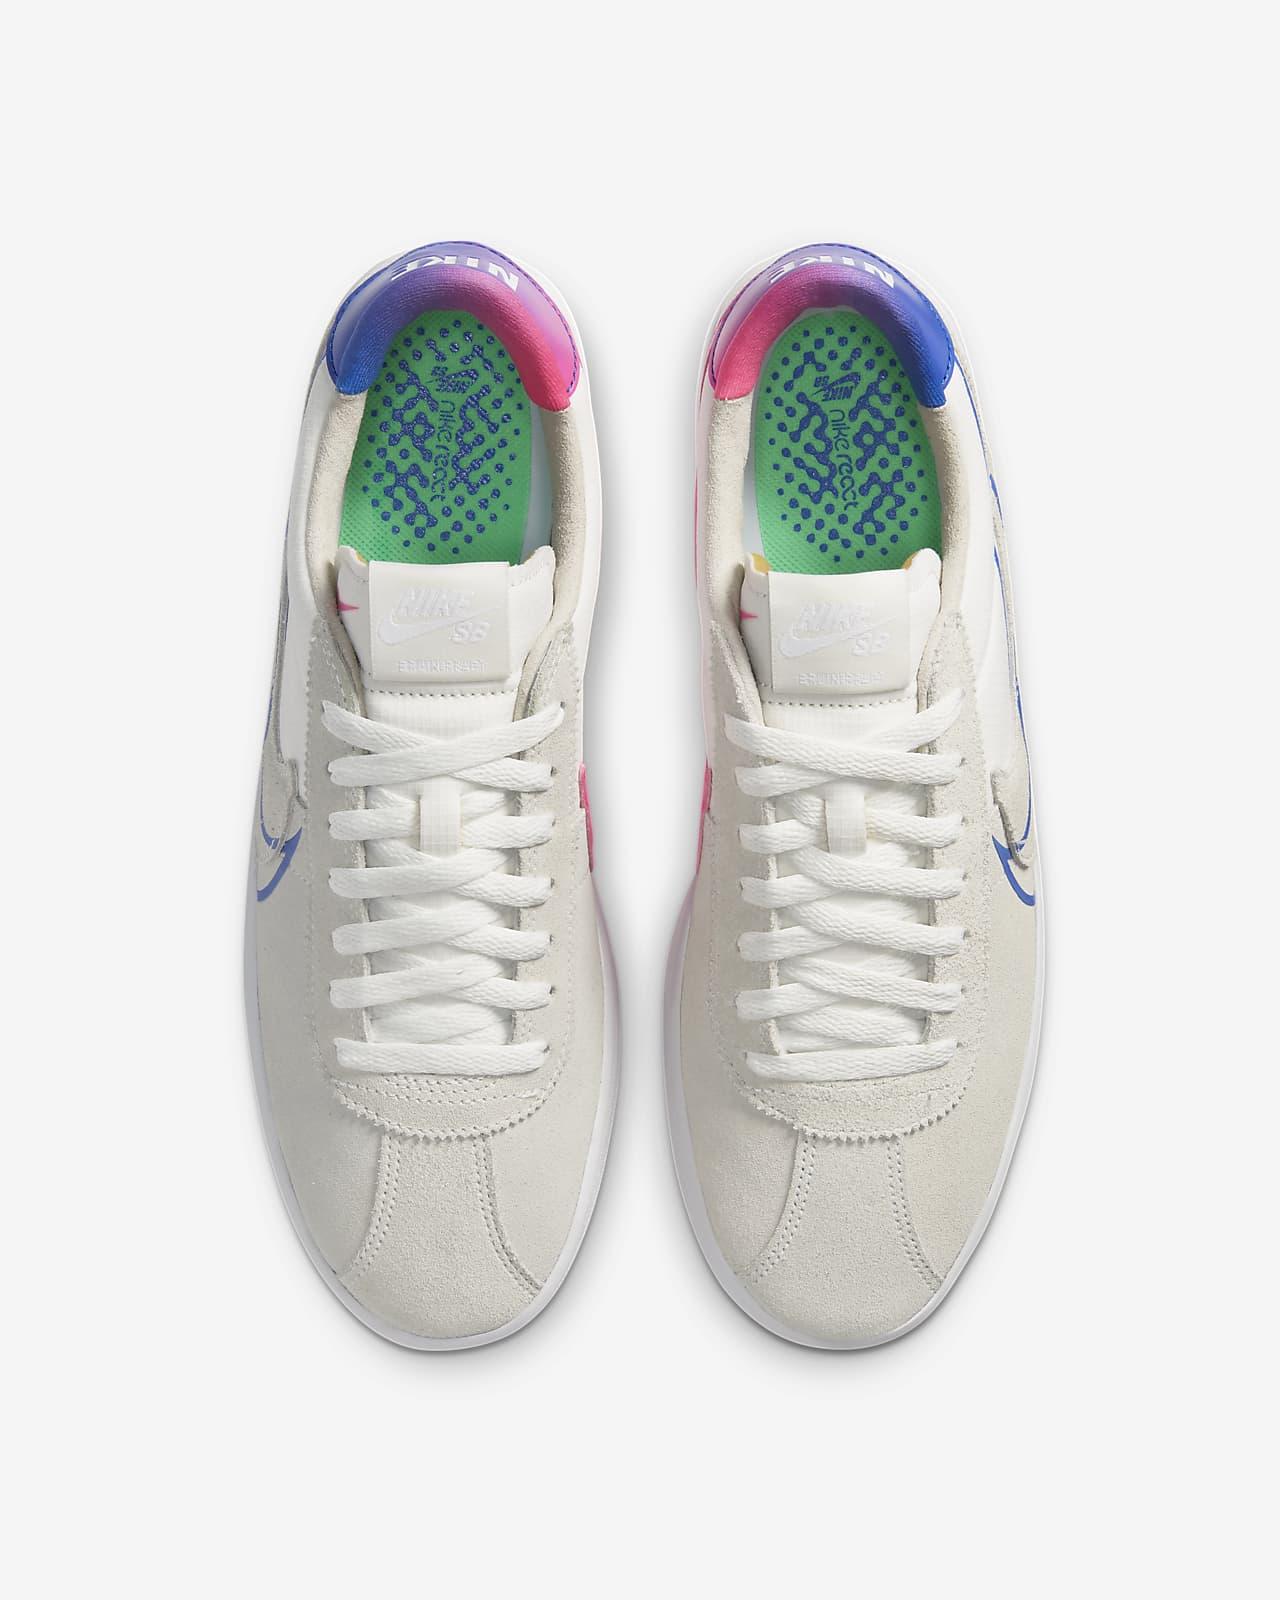 Chaussure de skateboard Nike SB Bruin React T